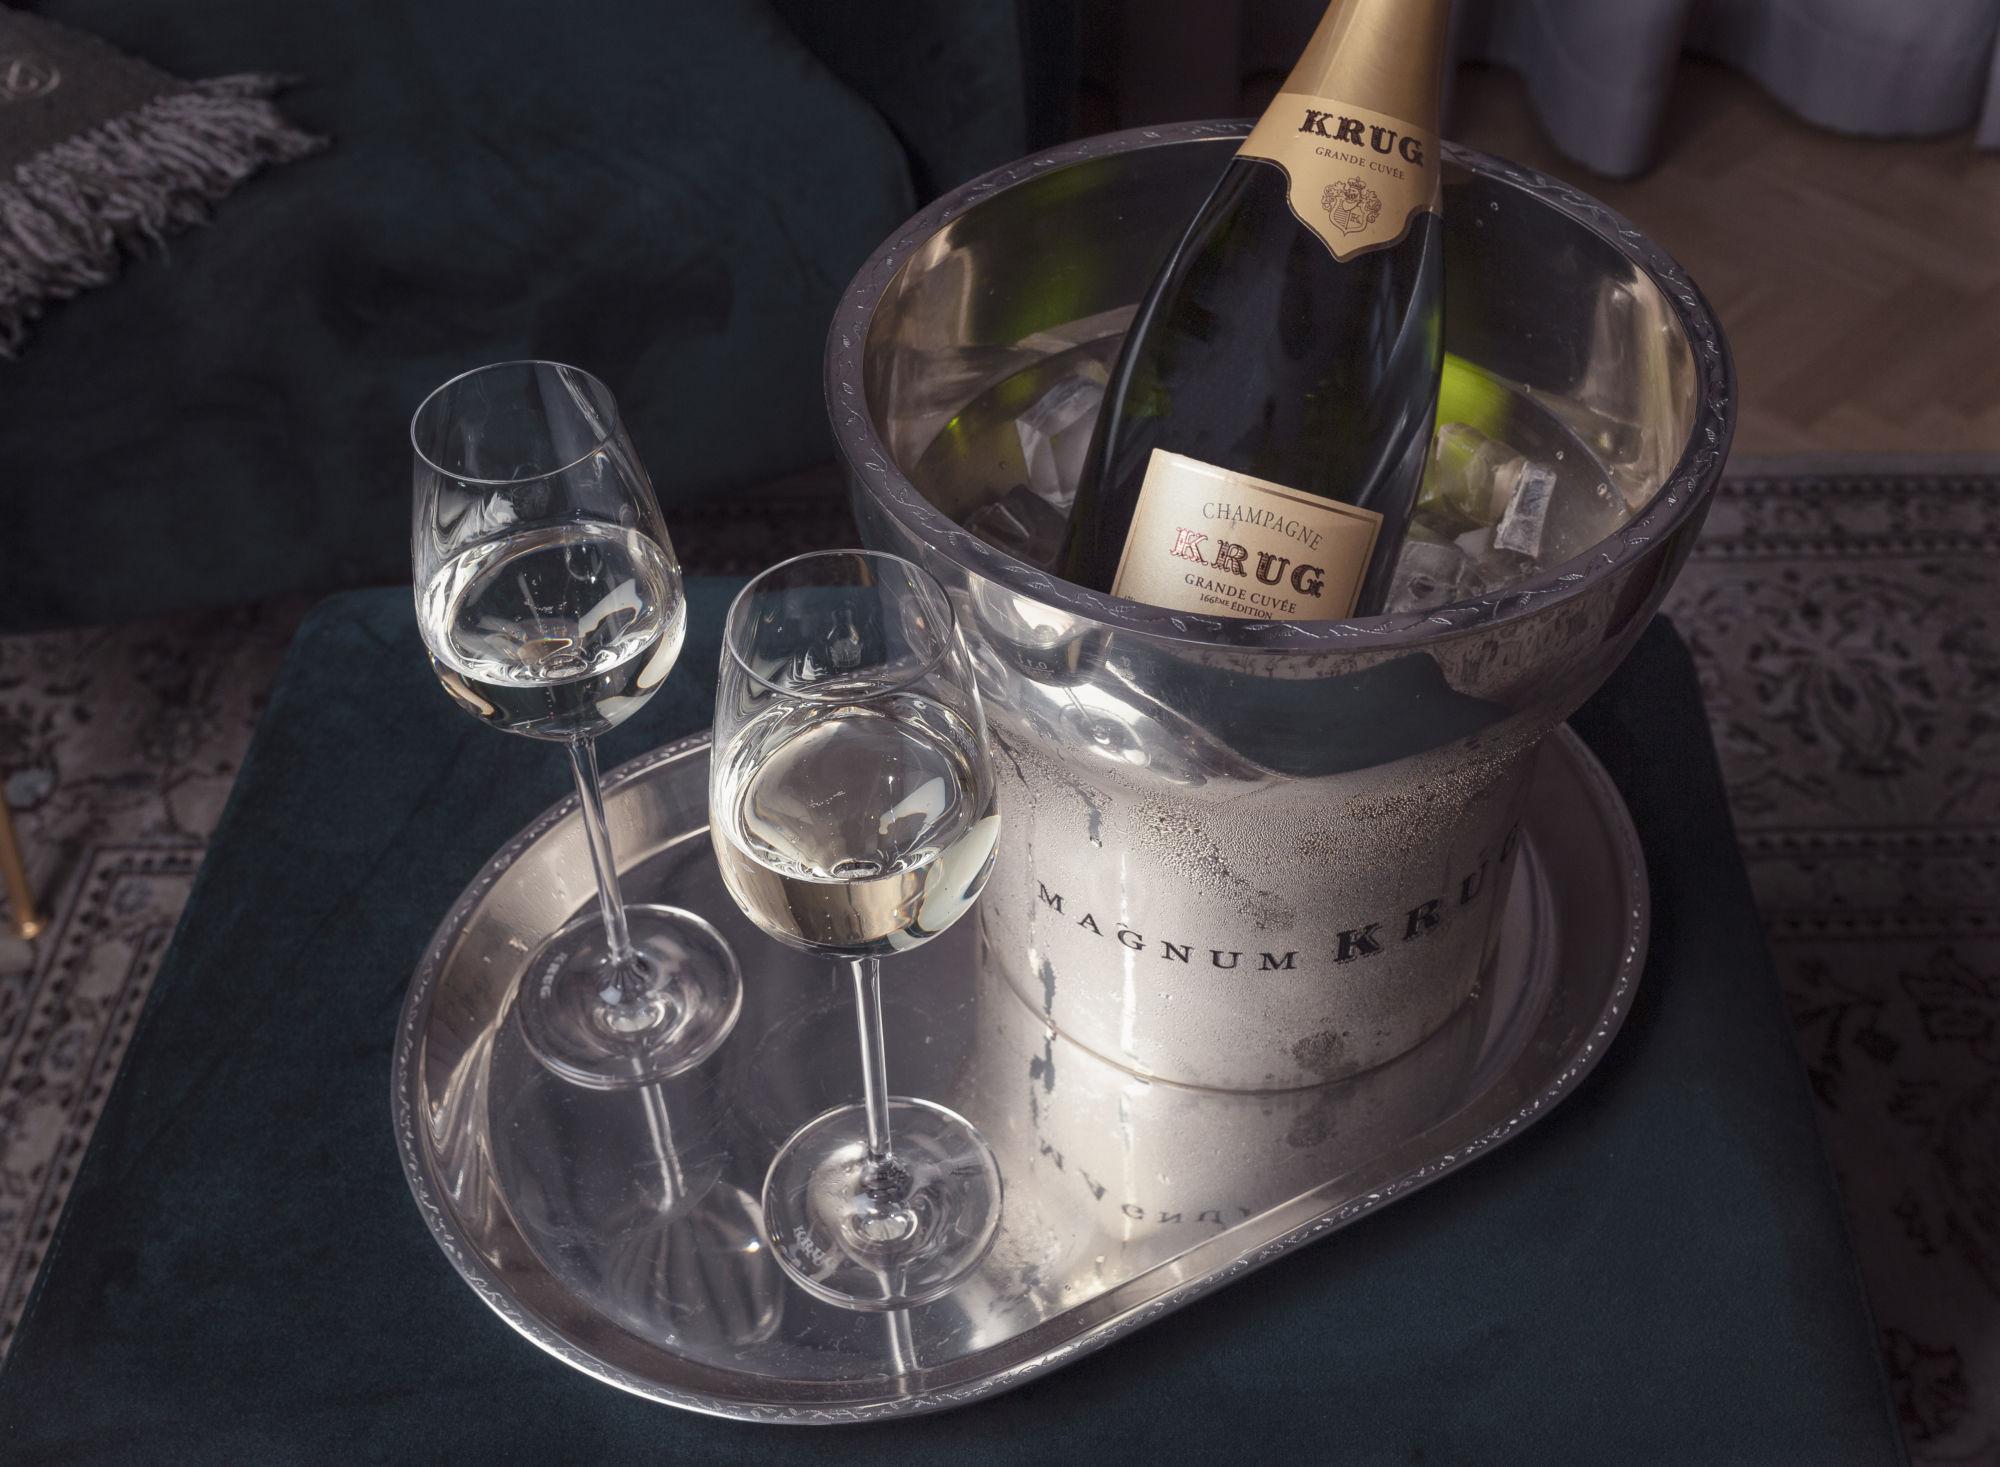 Nauti Krug samppanjasta Hotel St. Georgessa